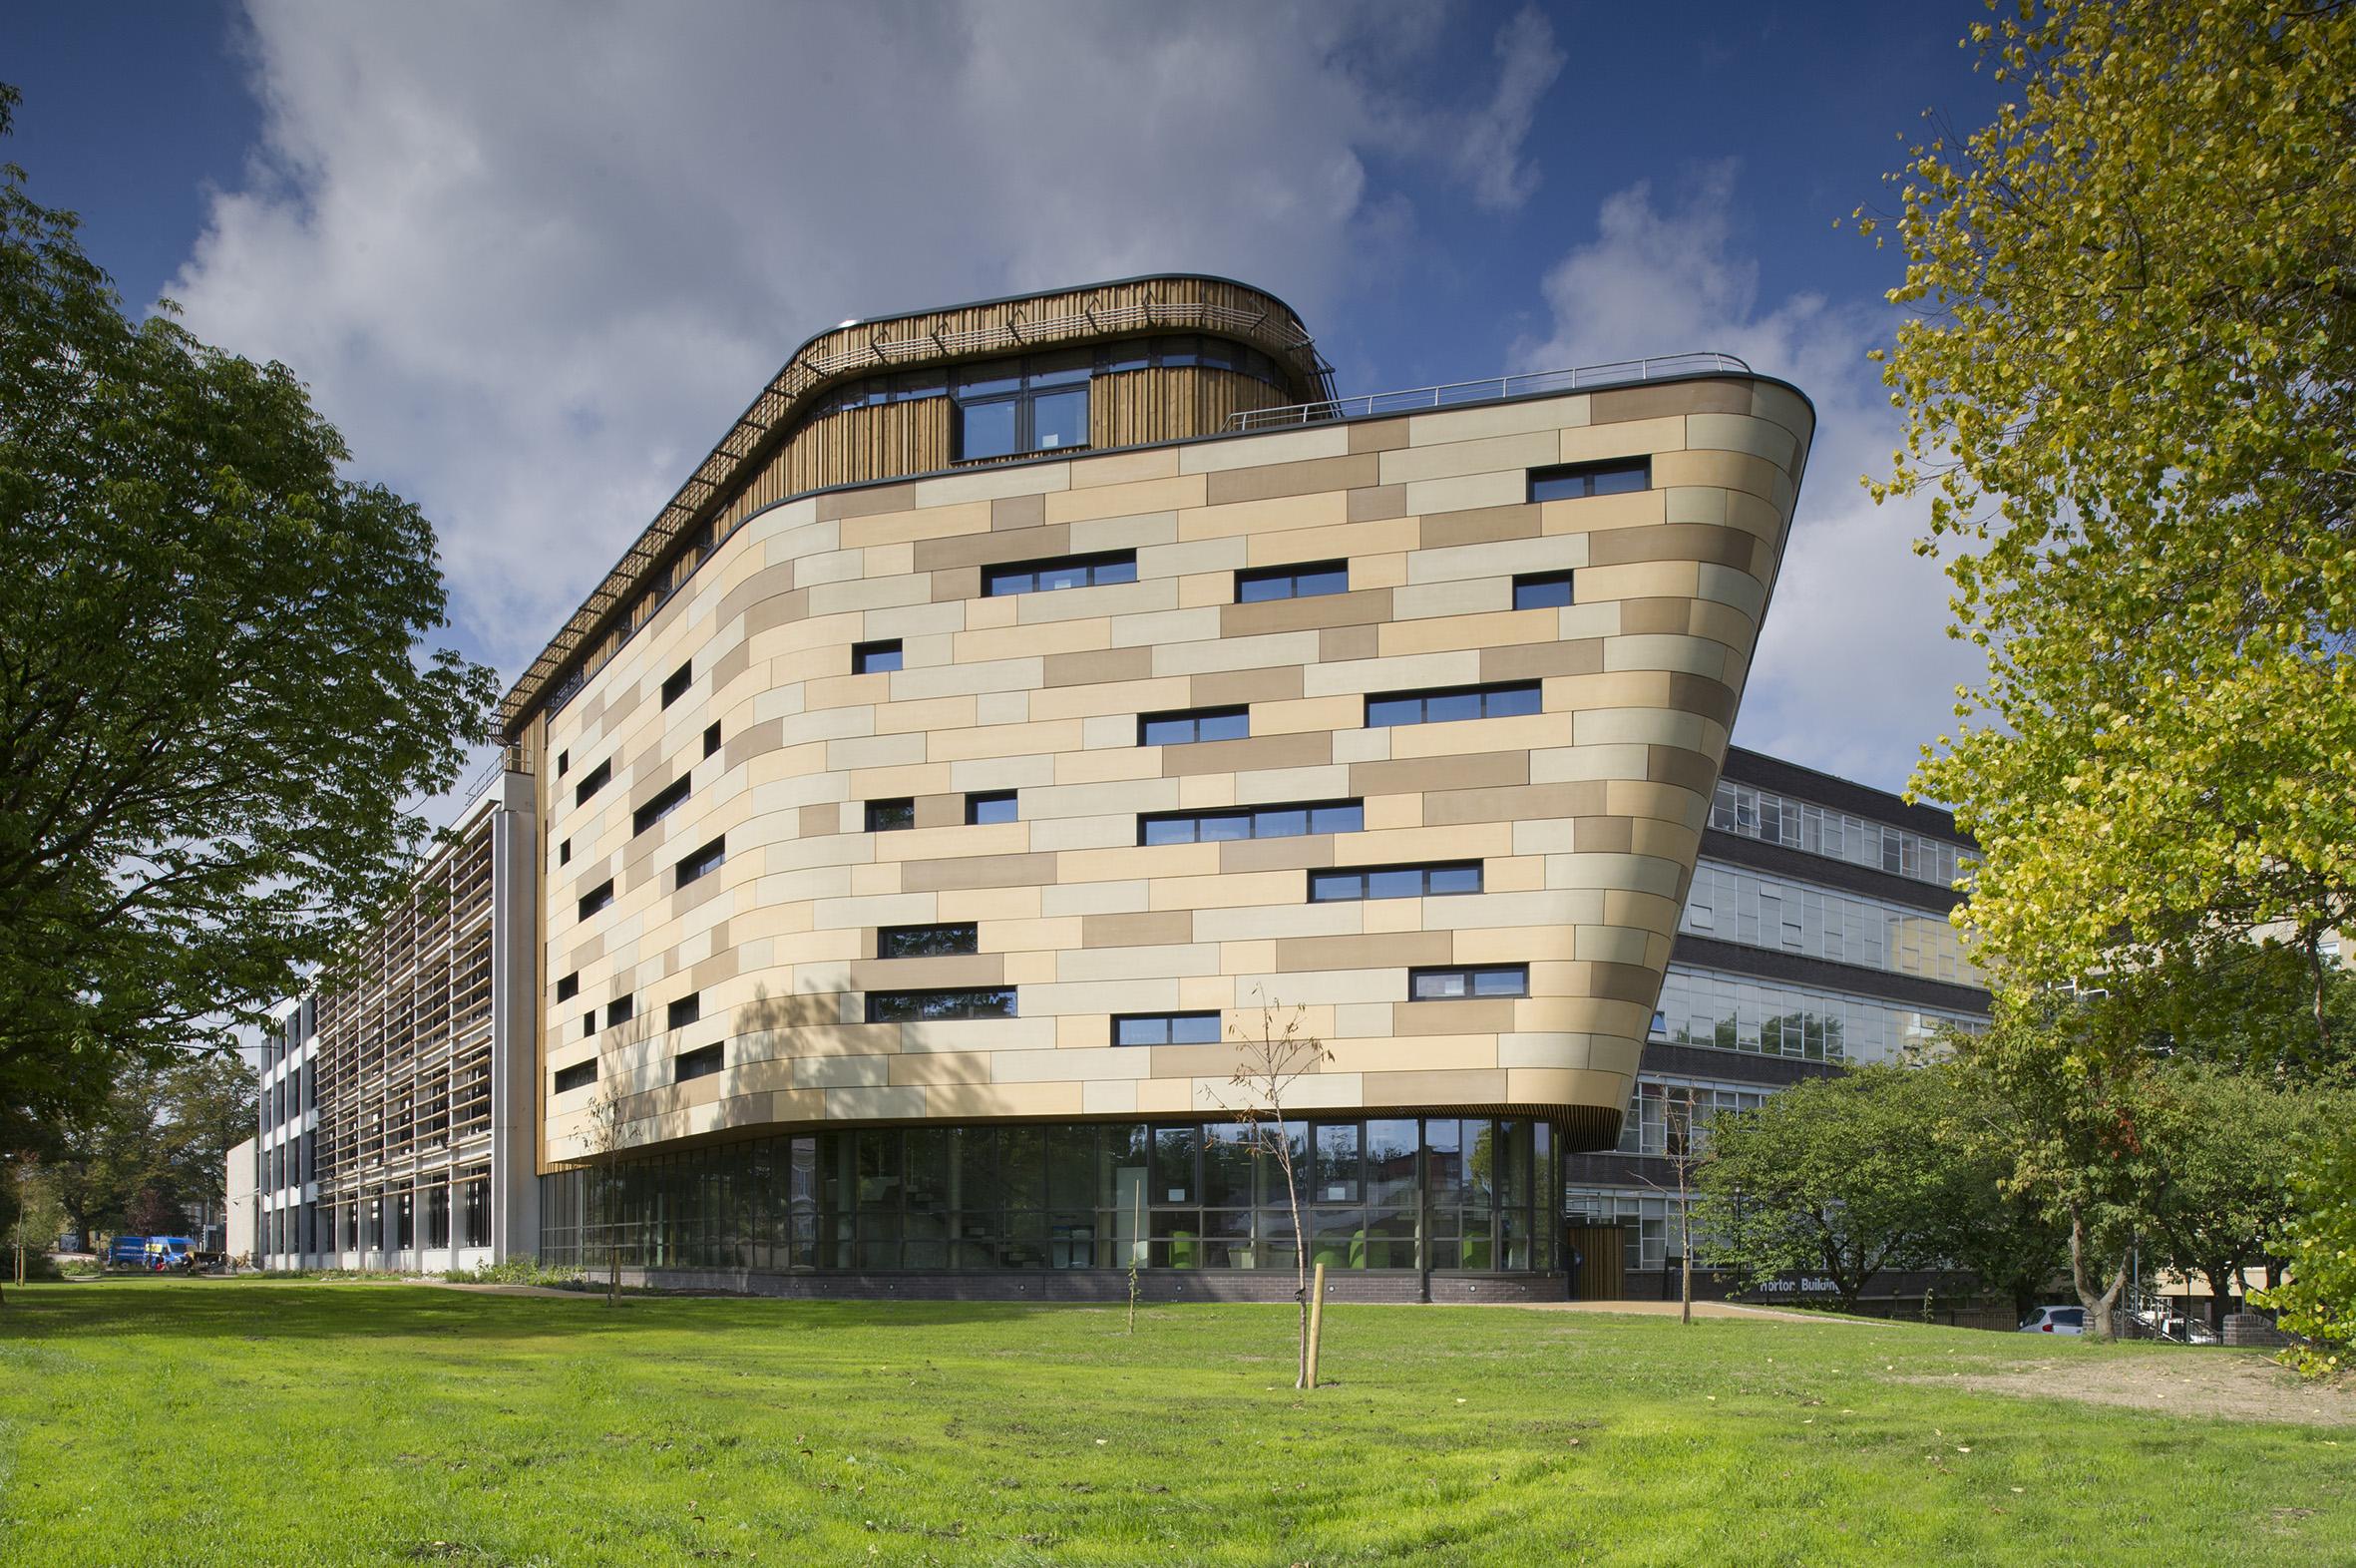 School of Health Studies. Bradford University